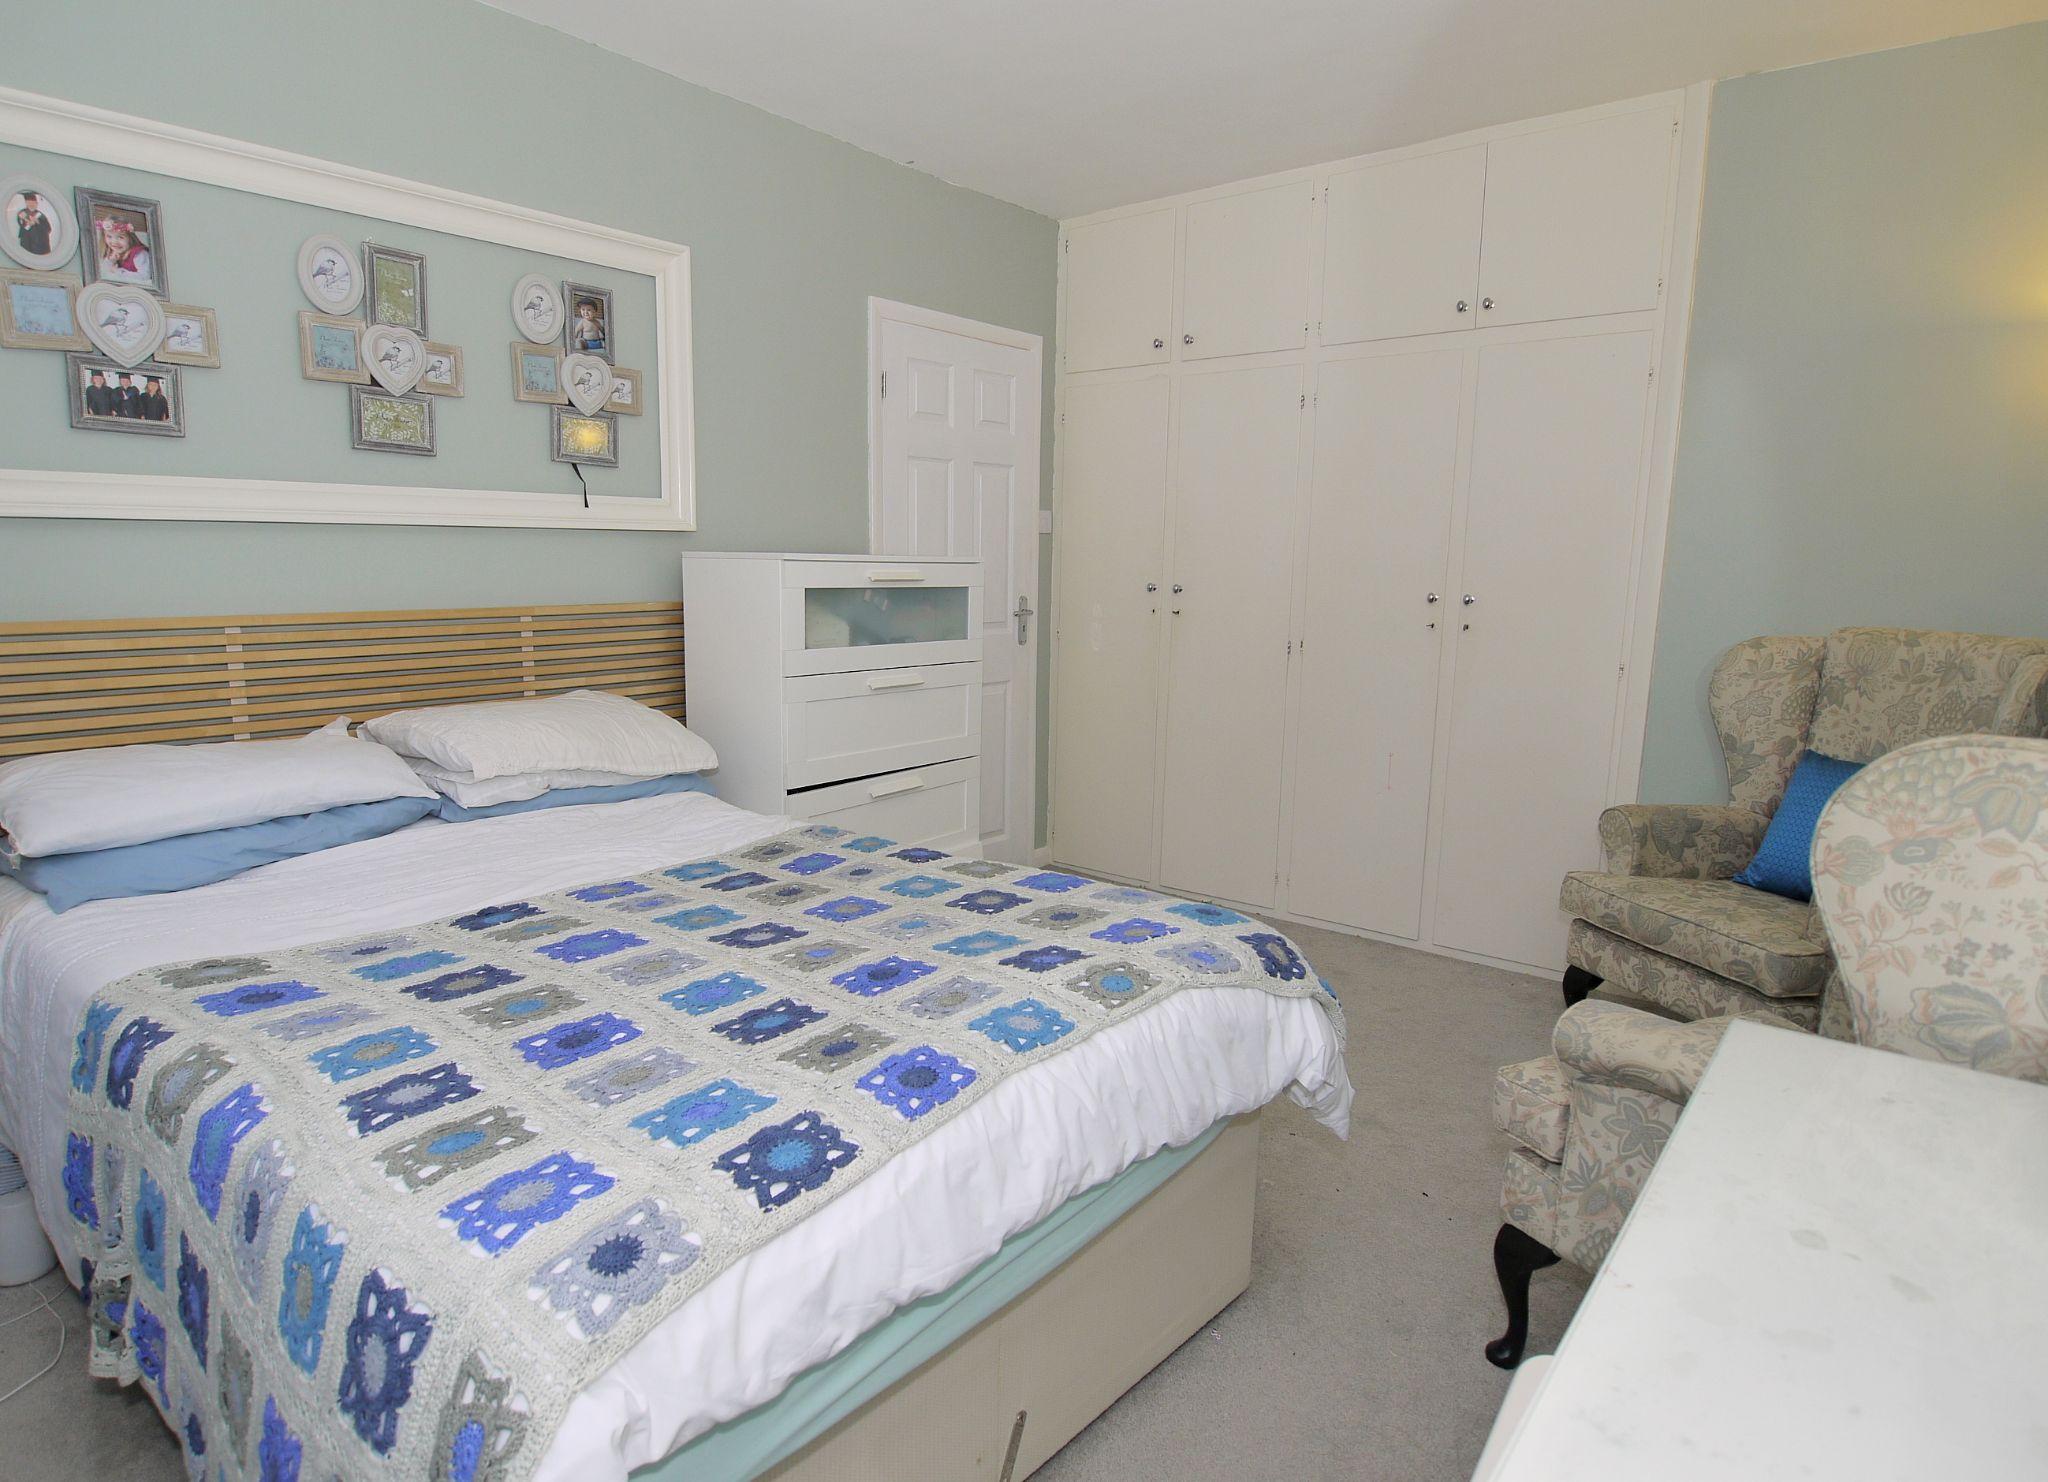 3 bedroom apartment Sale Agreed in Sevenoaks - Photograph 5